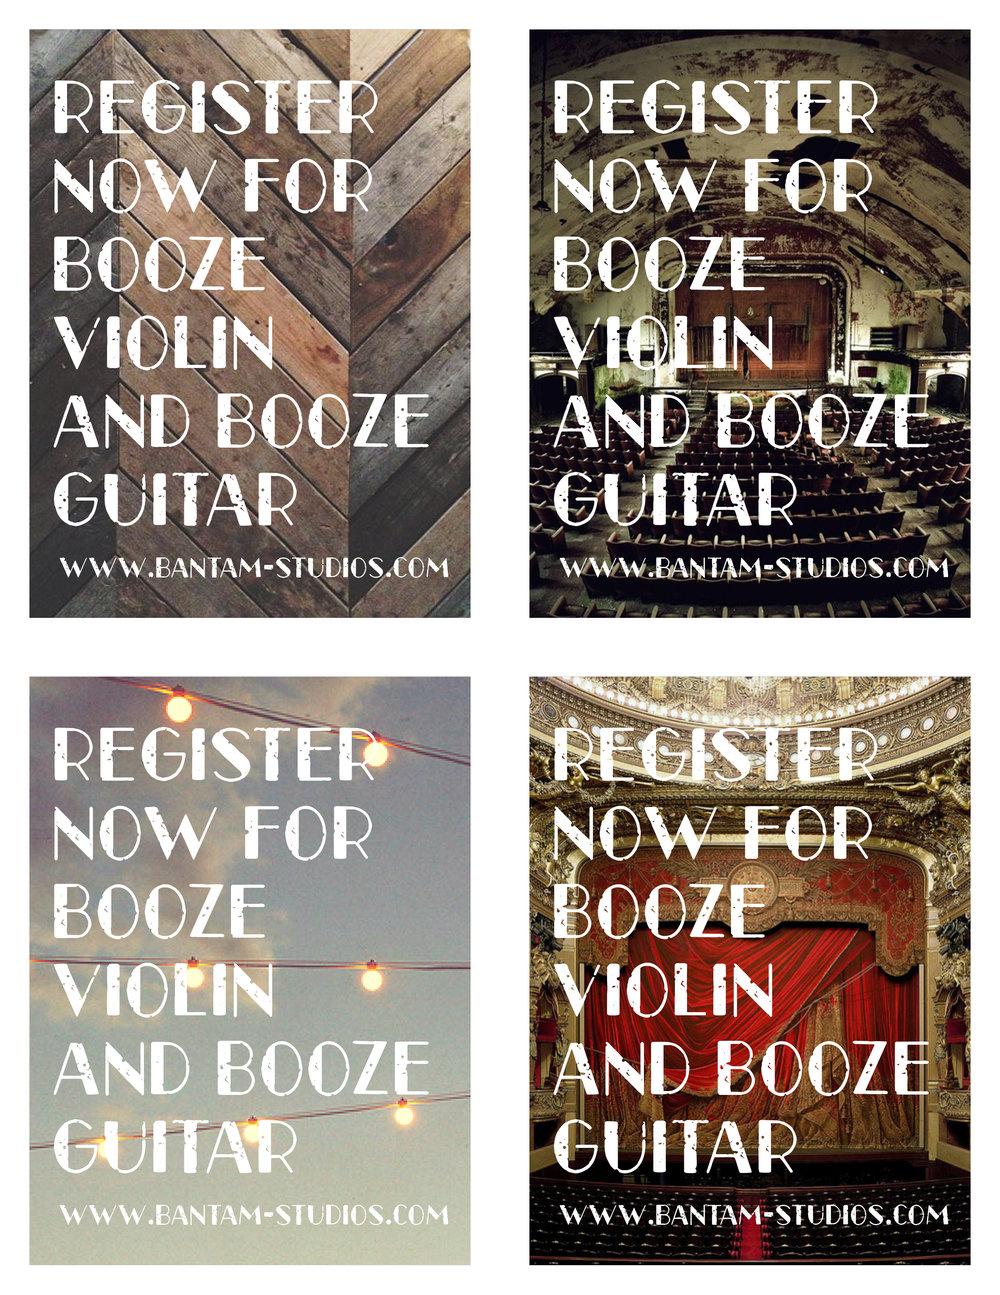 Booze Violin Fall 2014 Postcards2.jpg